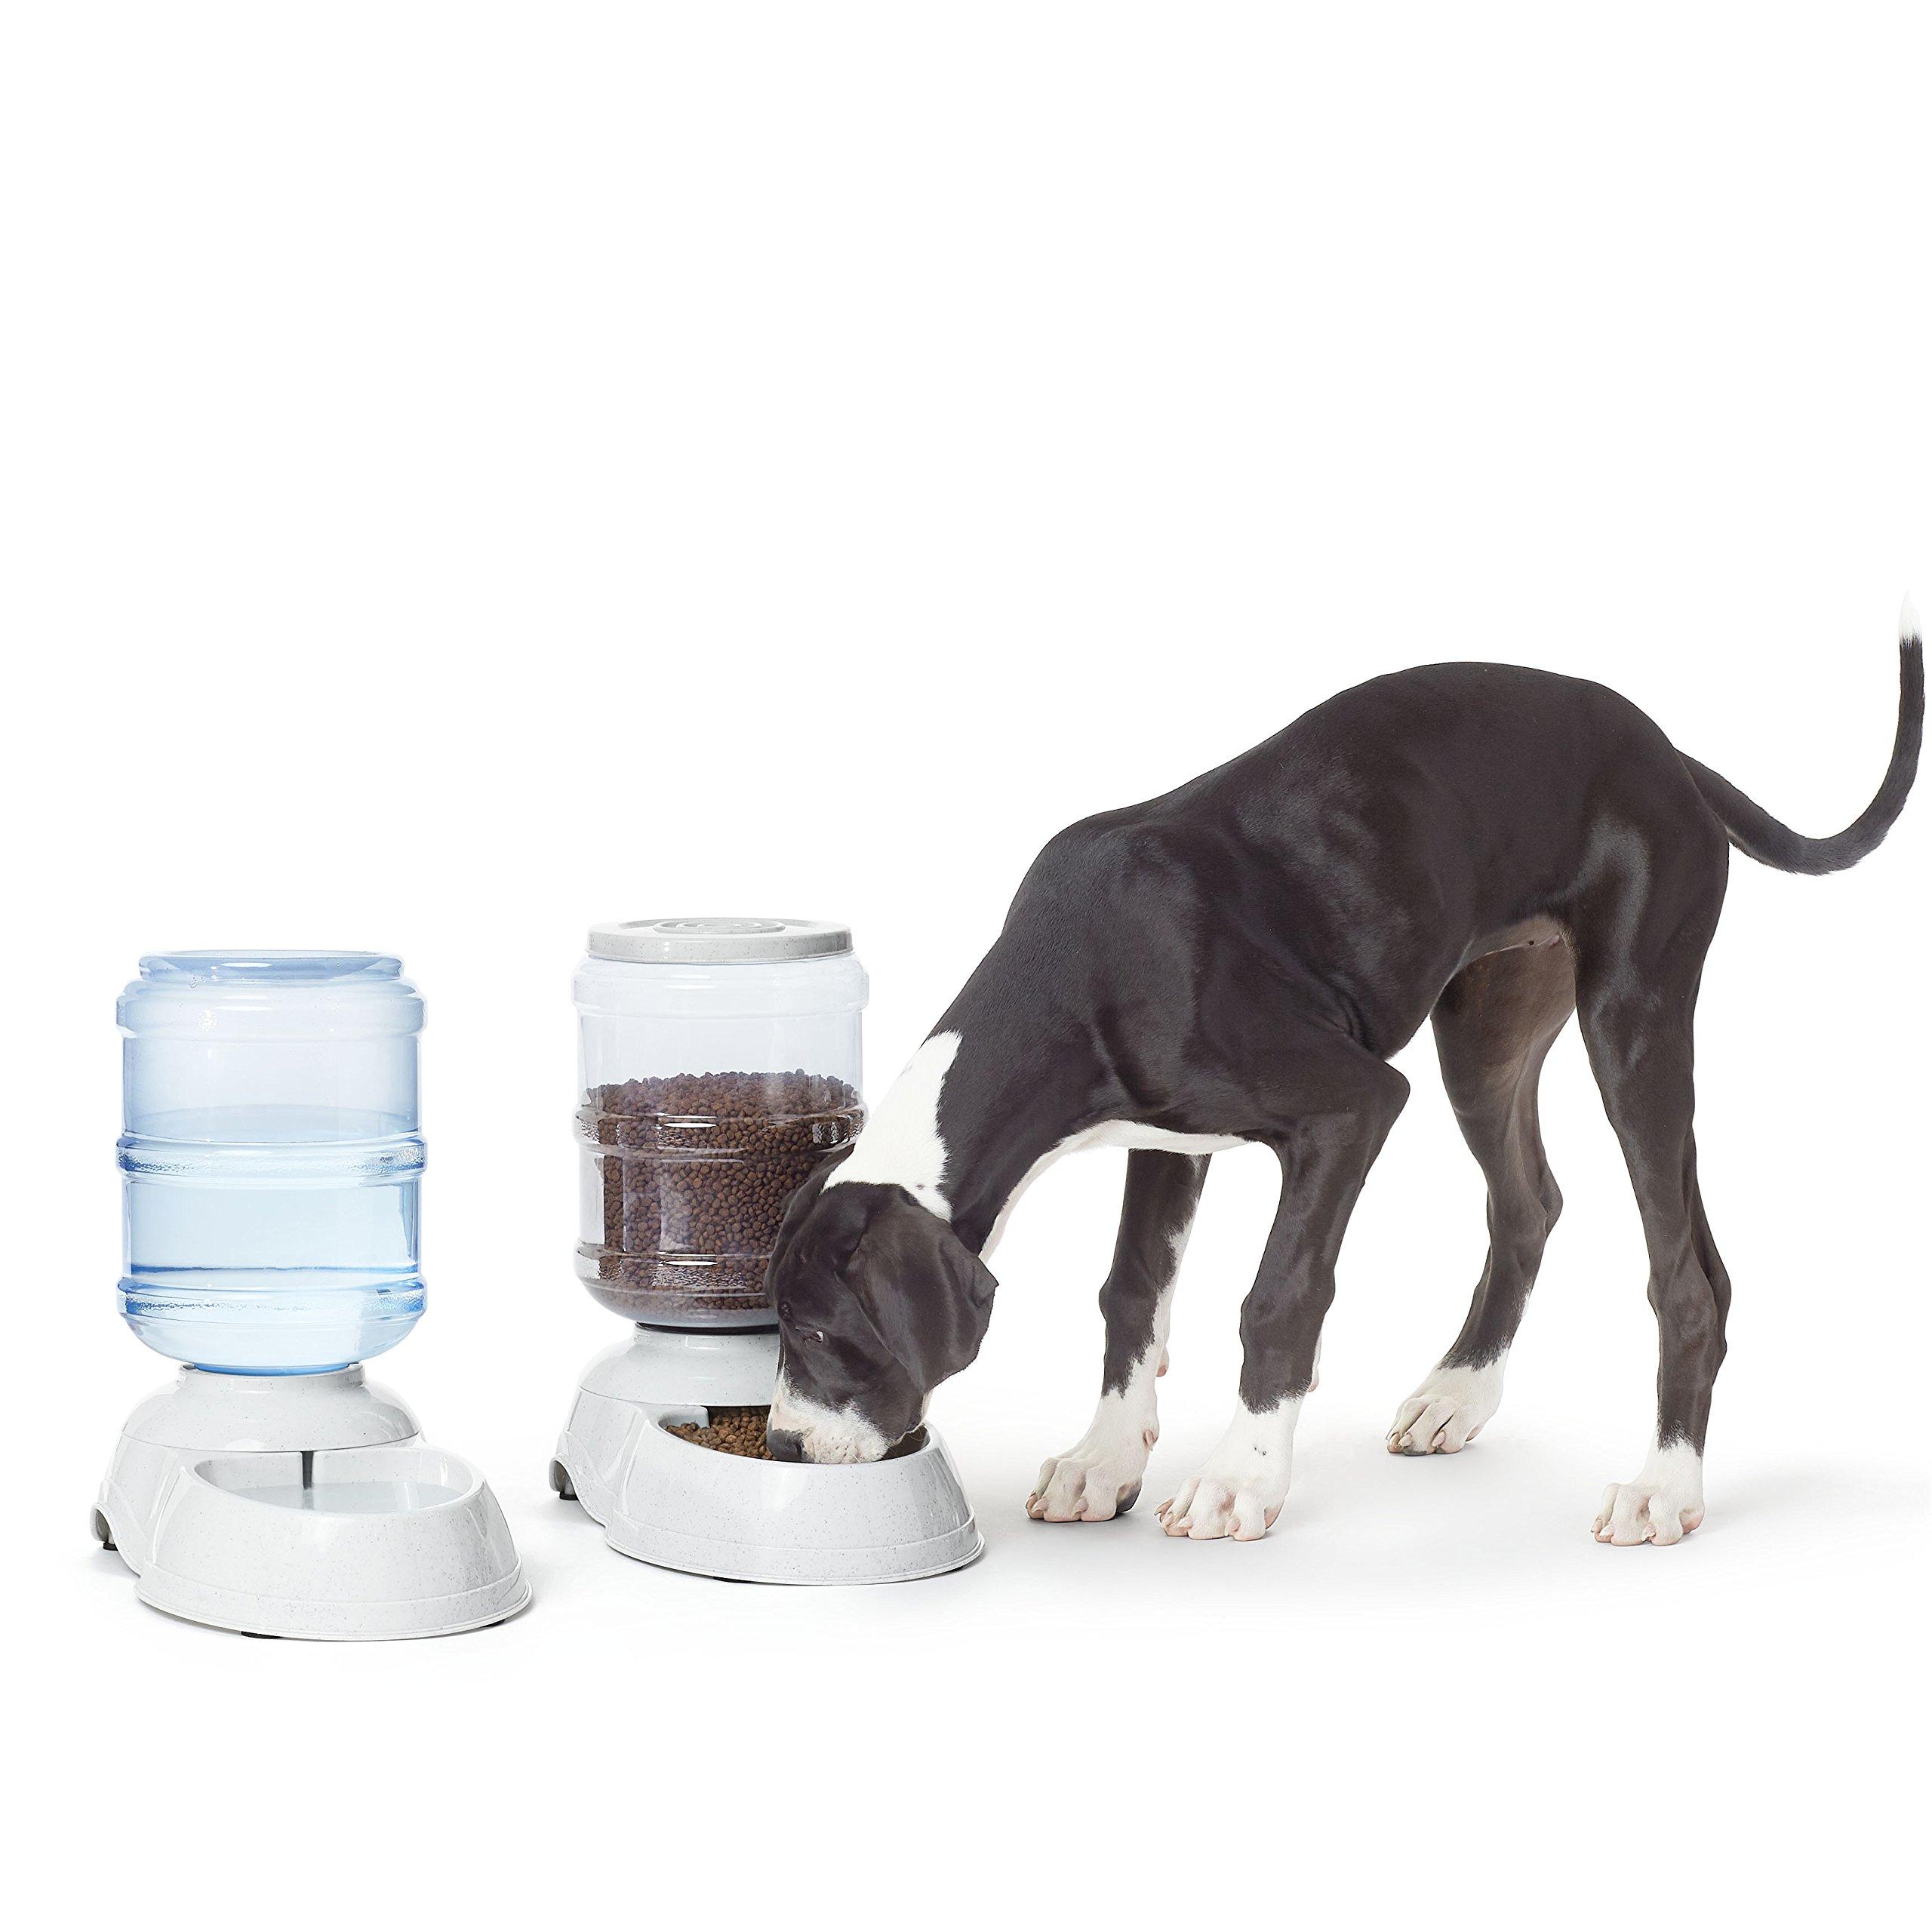 AmazonBasics Large Gravity Pet Food Feeder and Water Dispenser Bundle by AmazonBasics